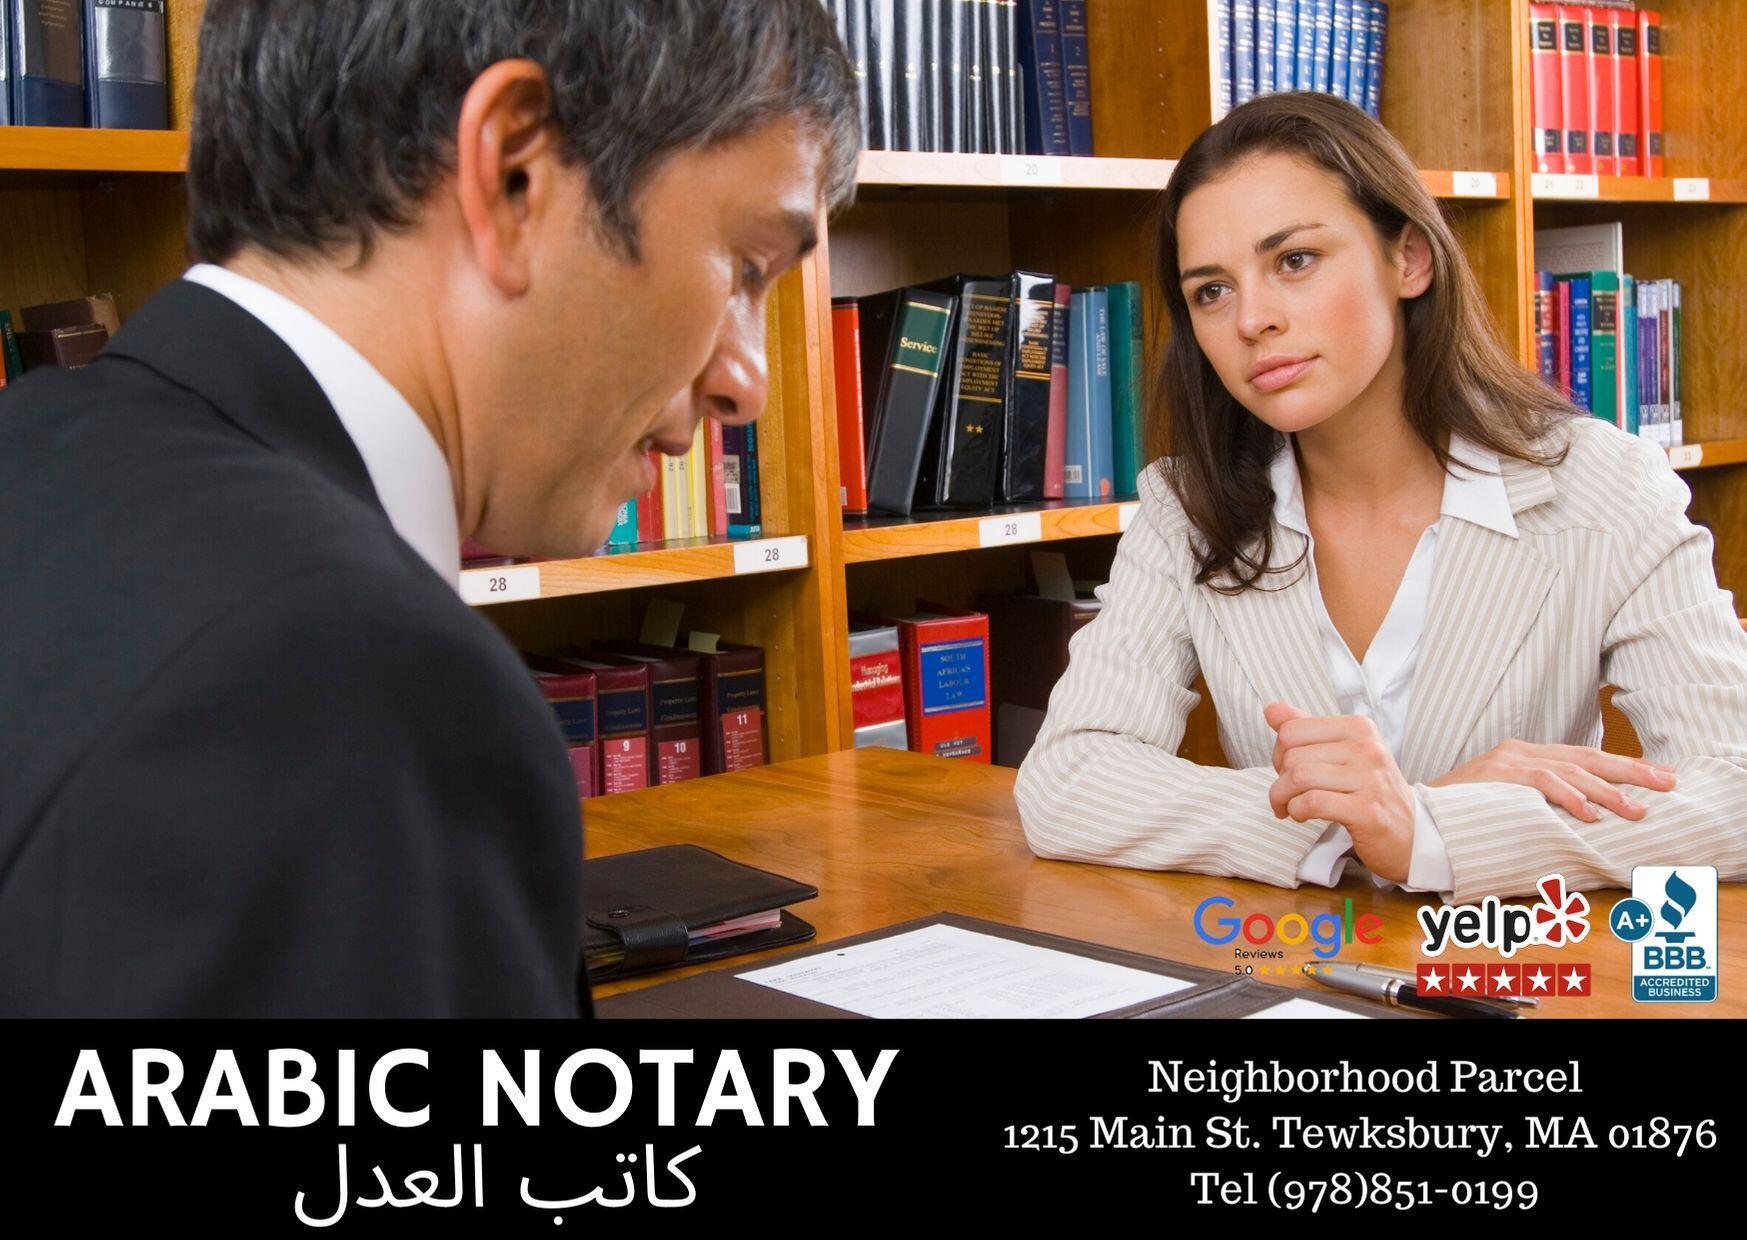 Arabic Notary Service